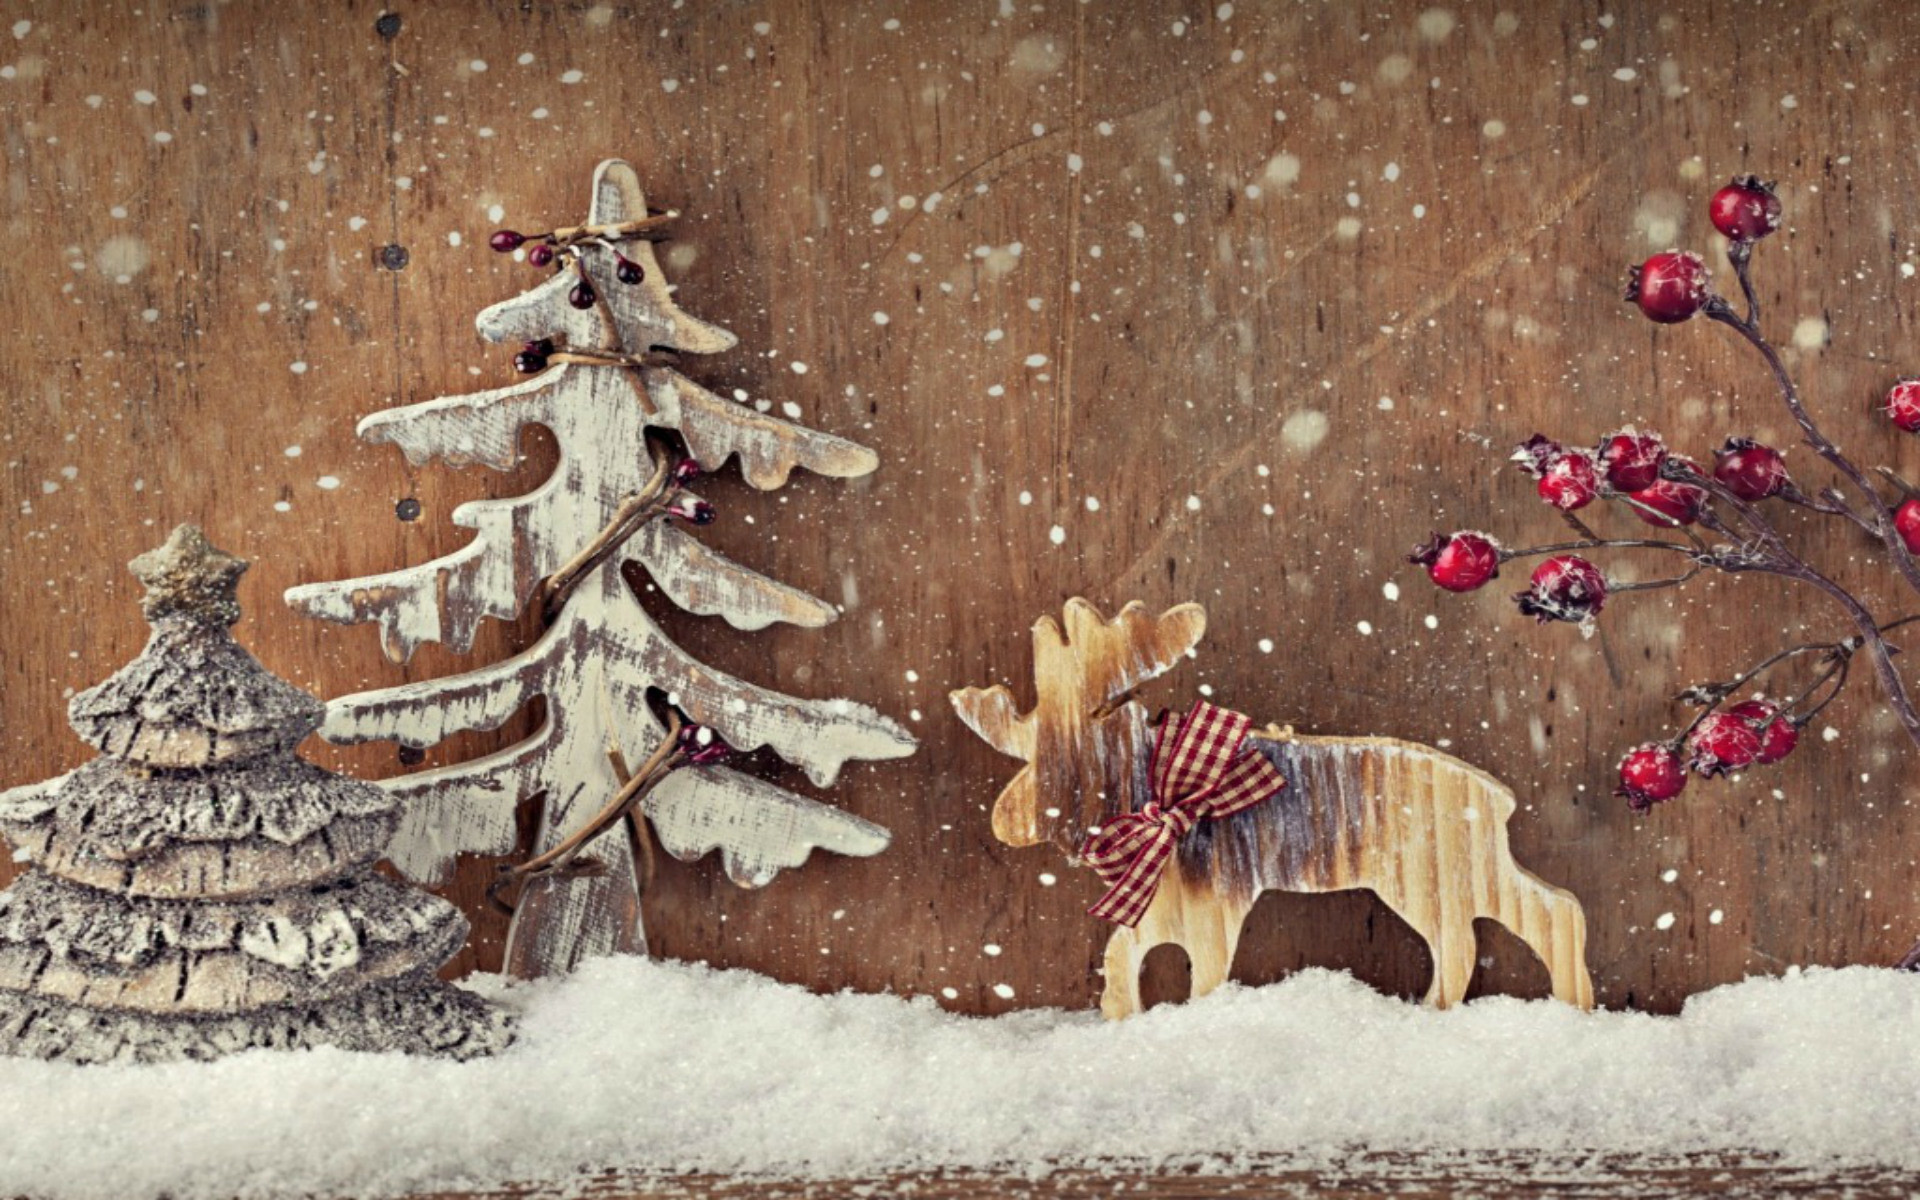 Christmas Wallpaper Desktop (64+ Images